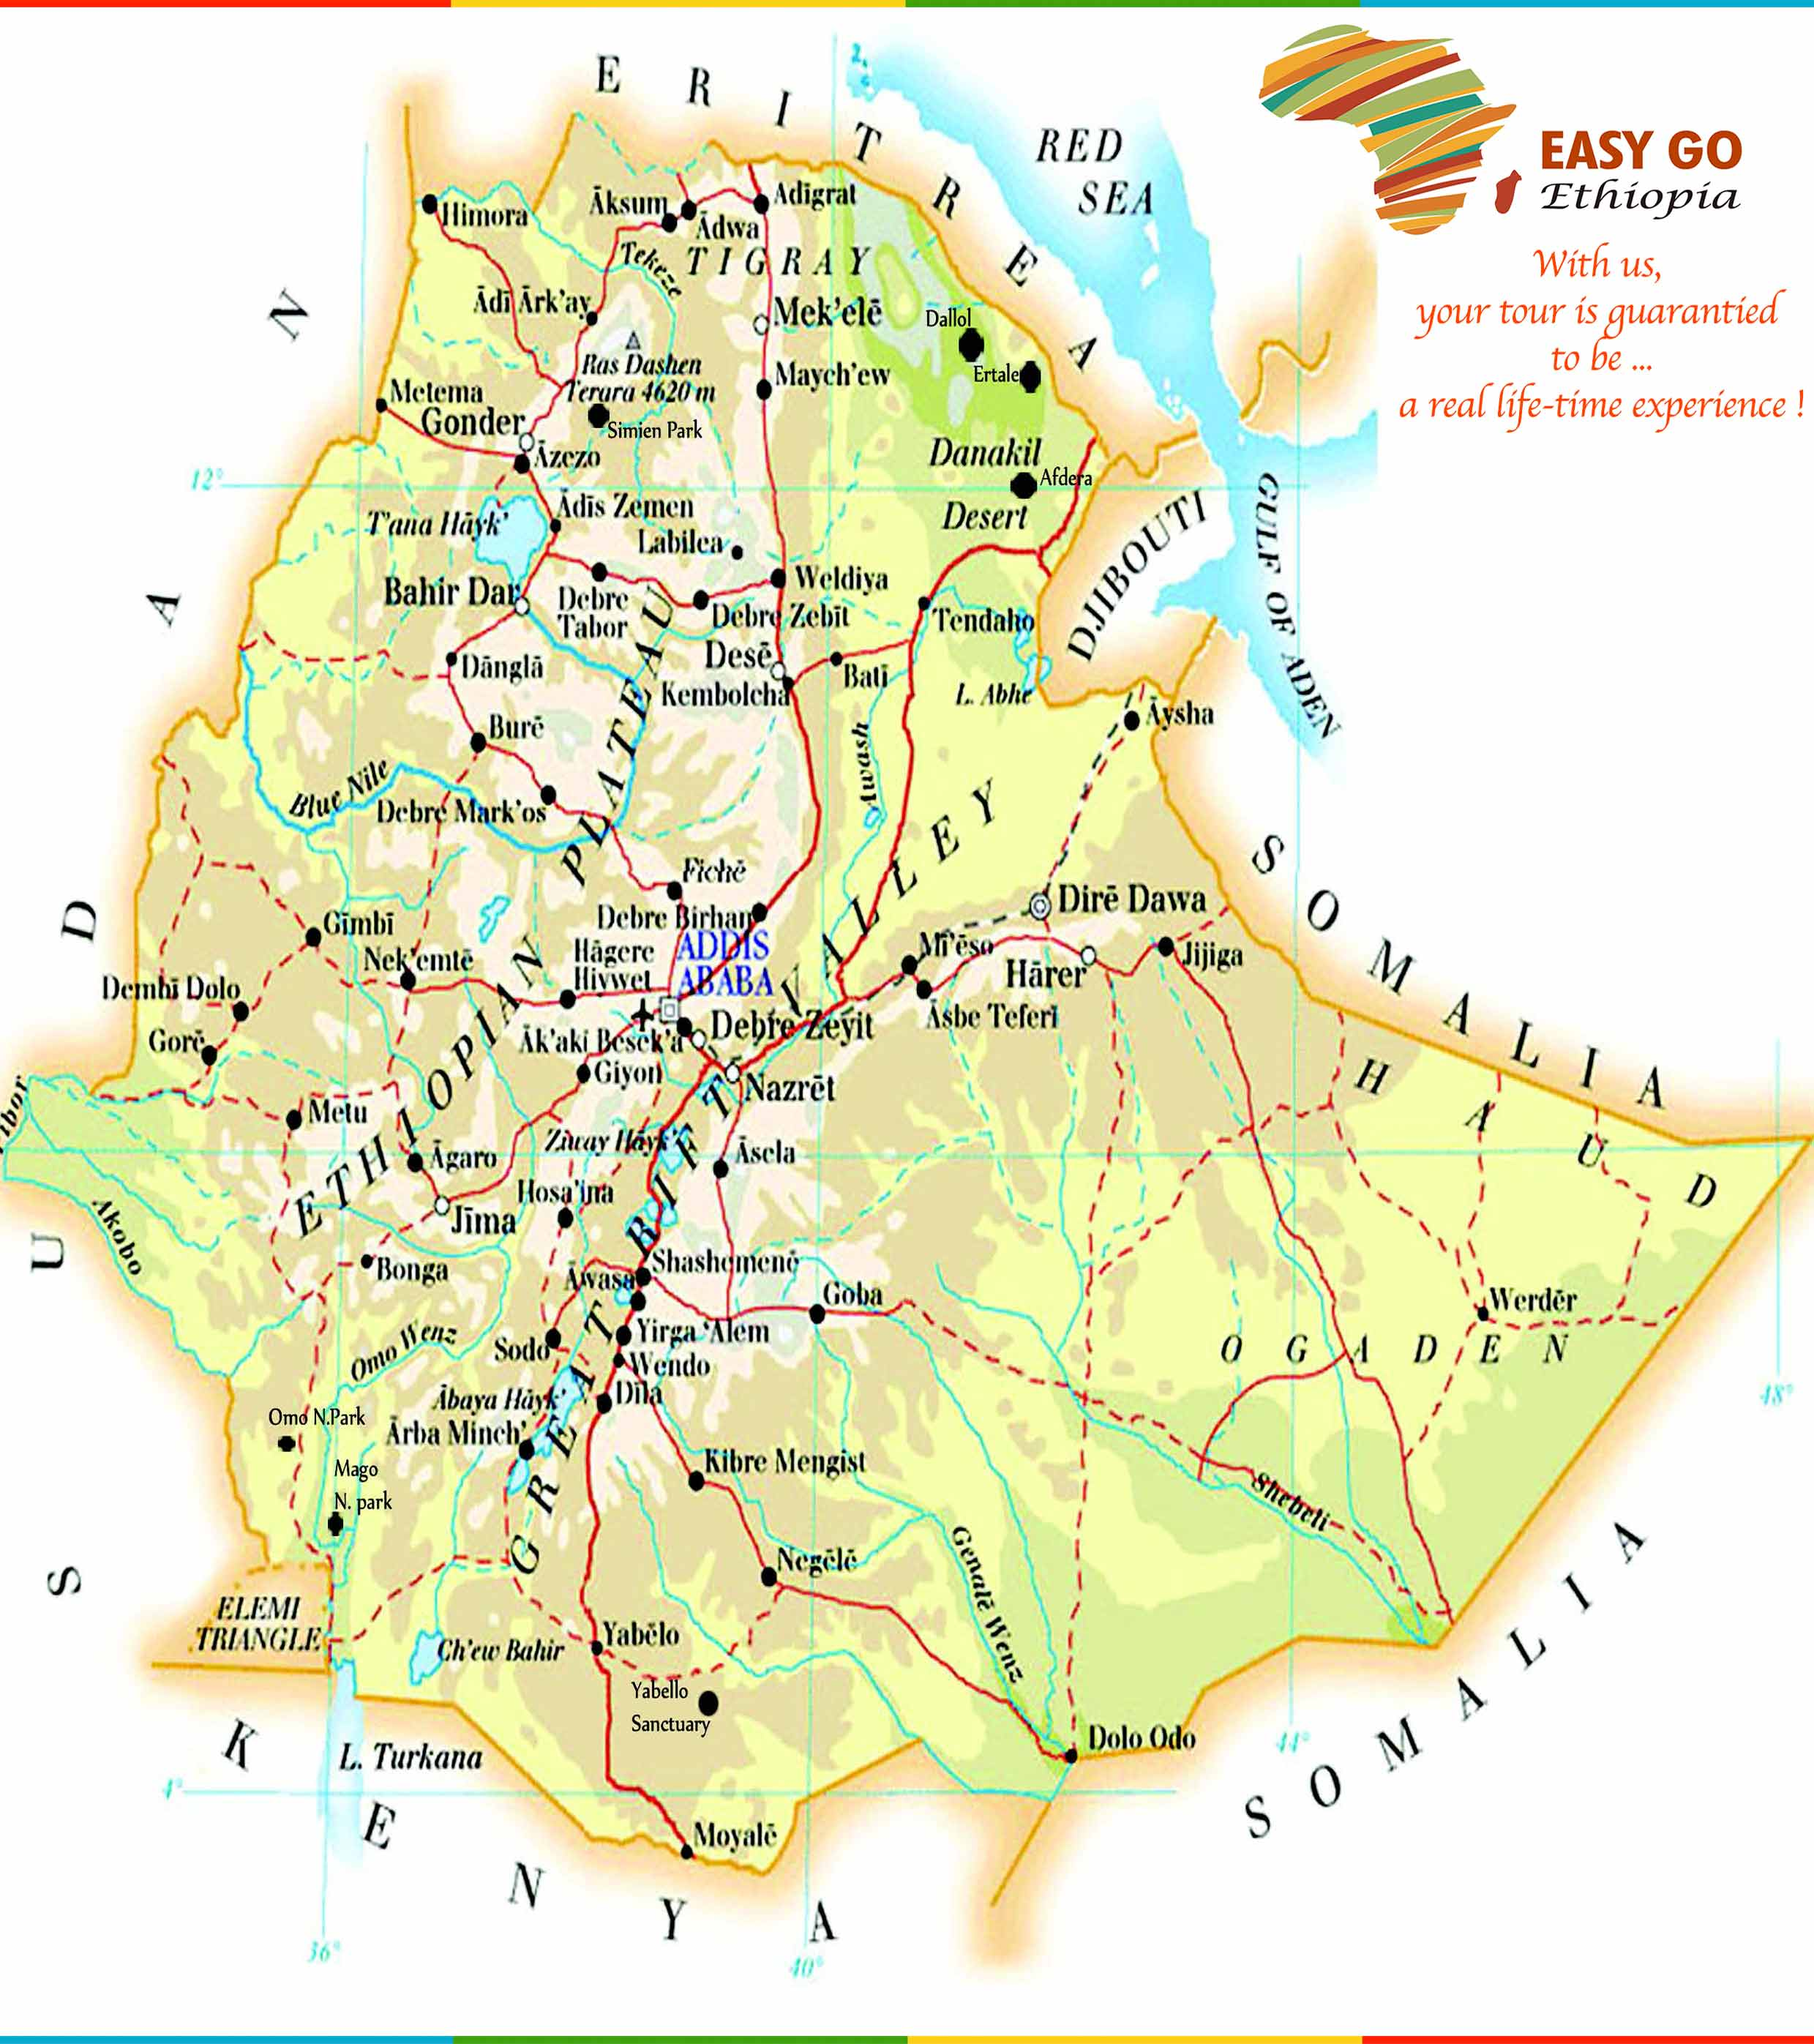 ethiopian_map_easygo_ethiopia